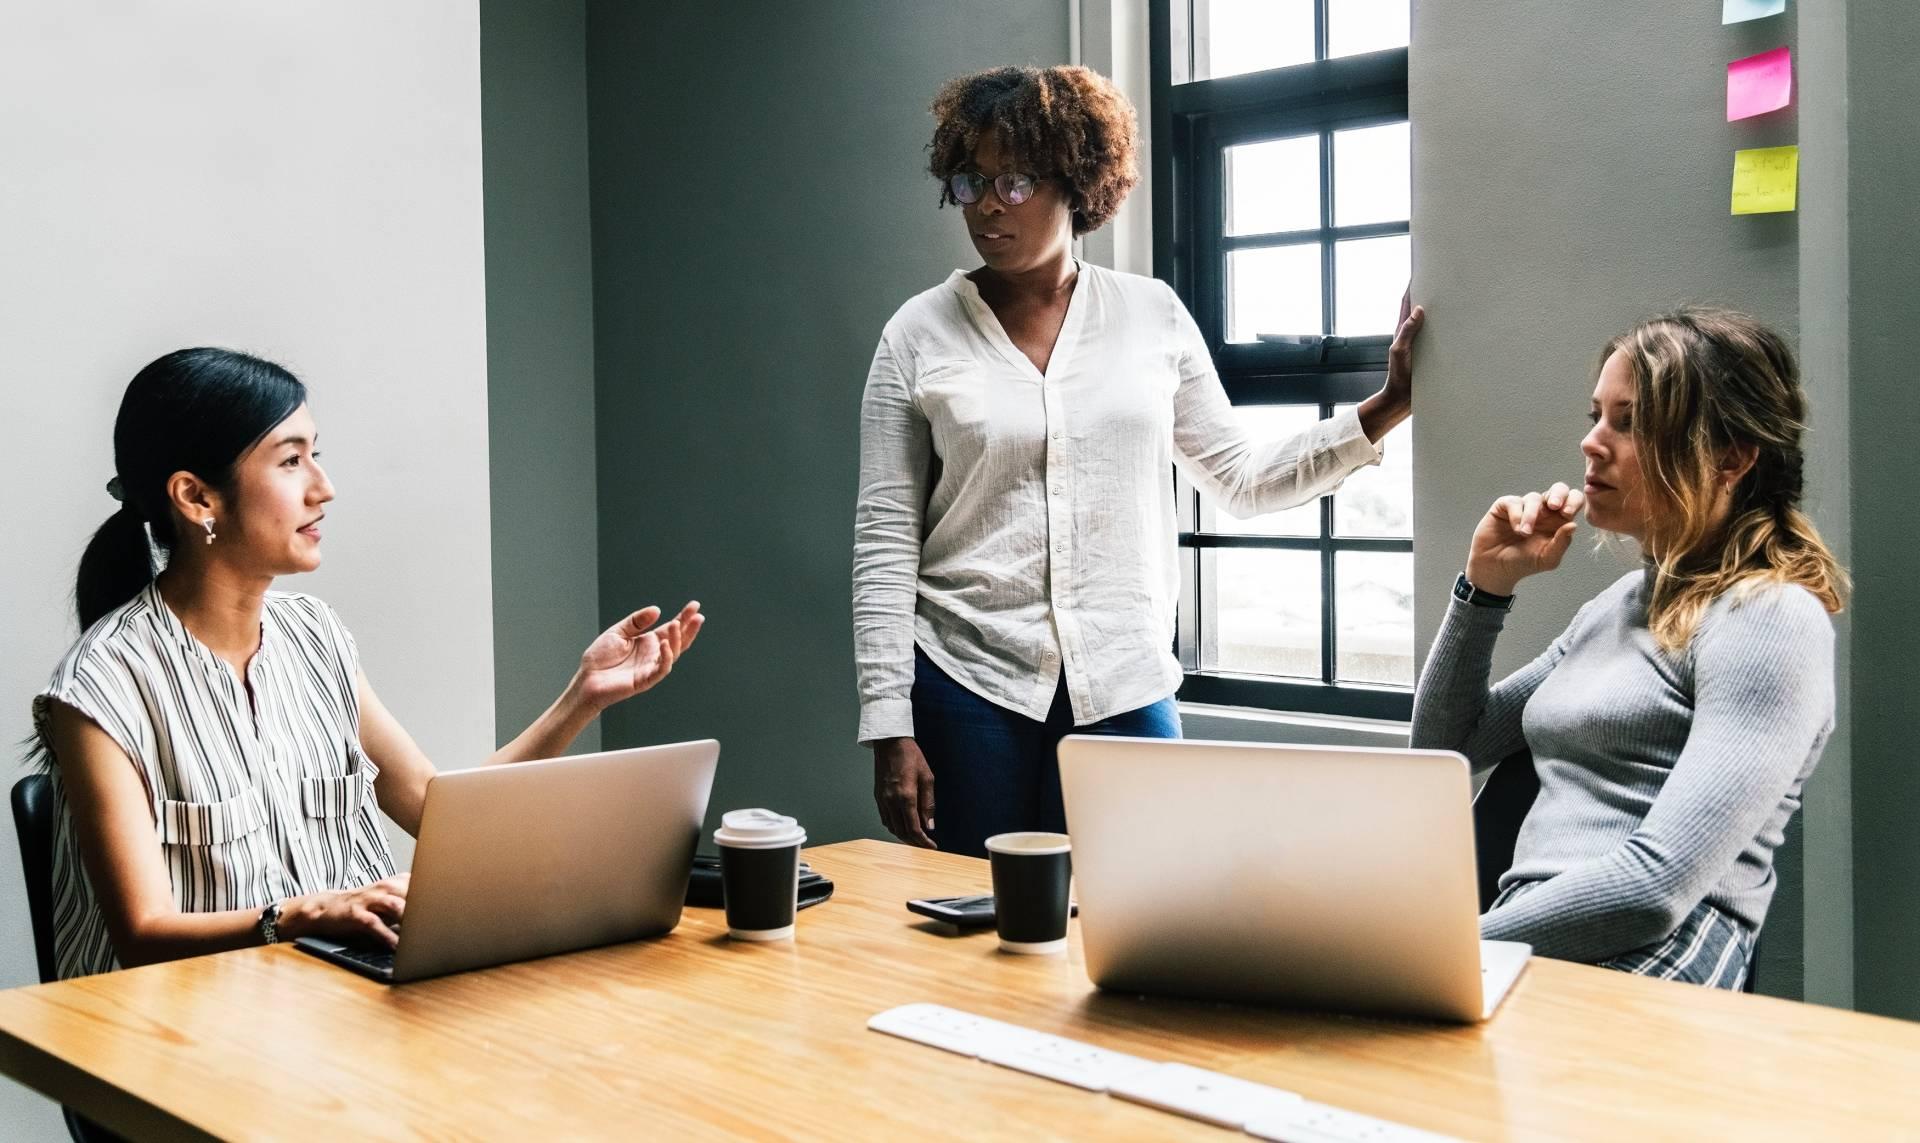 emale Entrepreneur Challenges